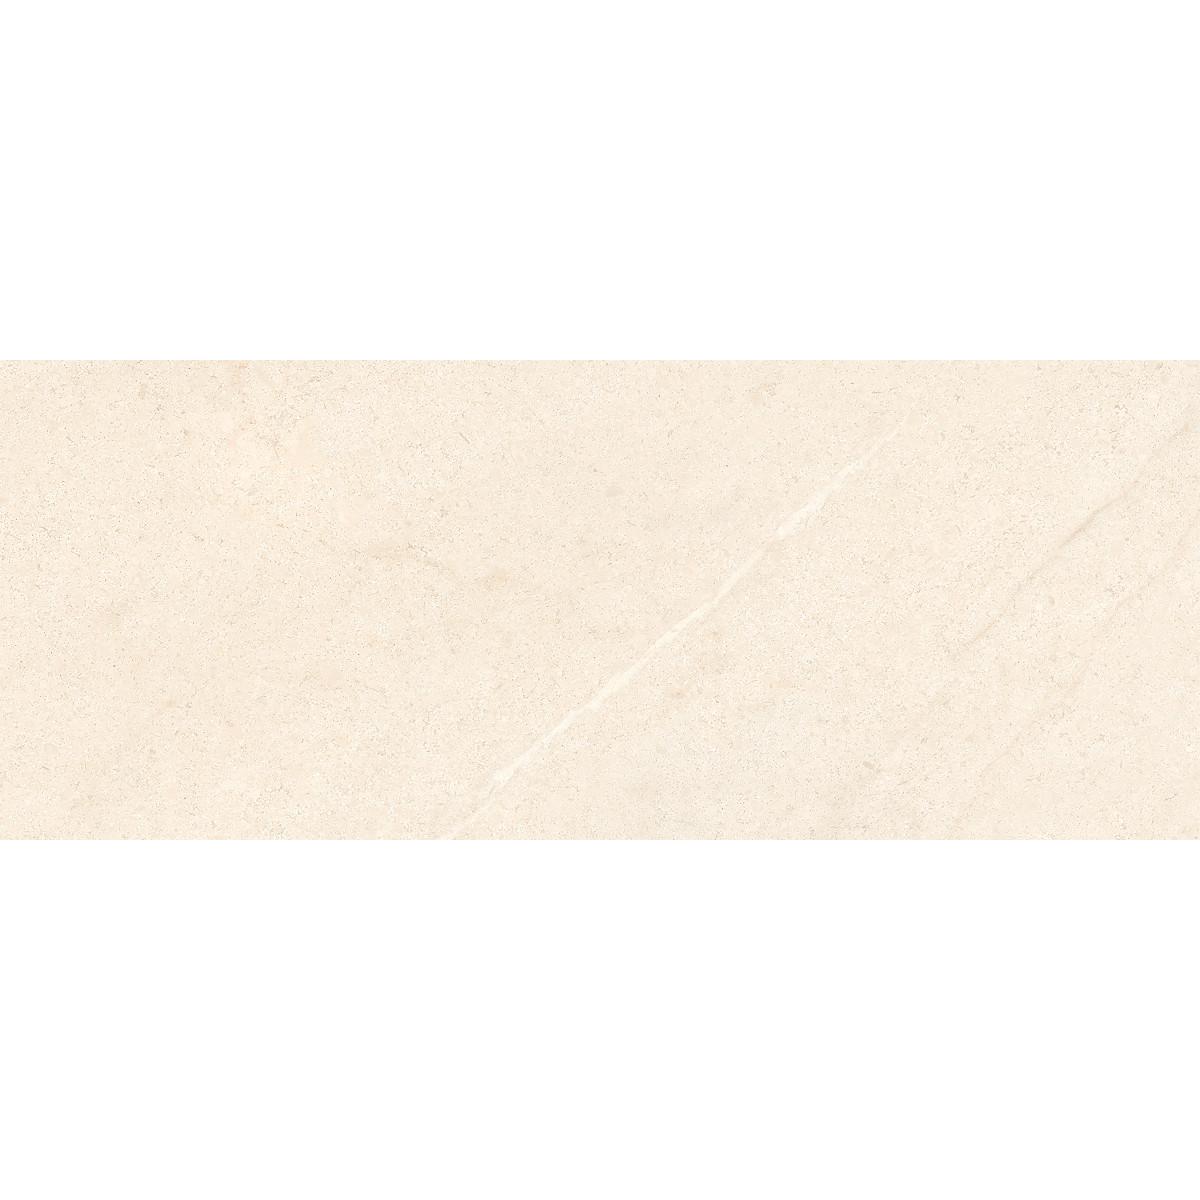 Плитка настенная Пиона 20x50 см 1.3 м² цвет бежевый